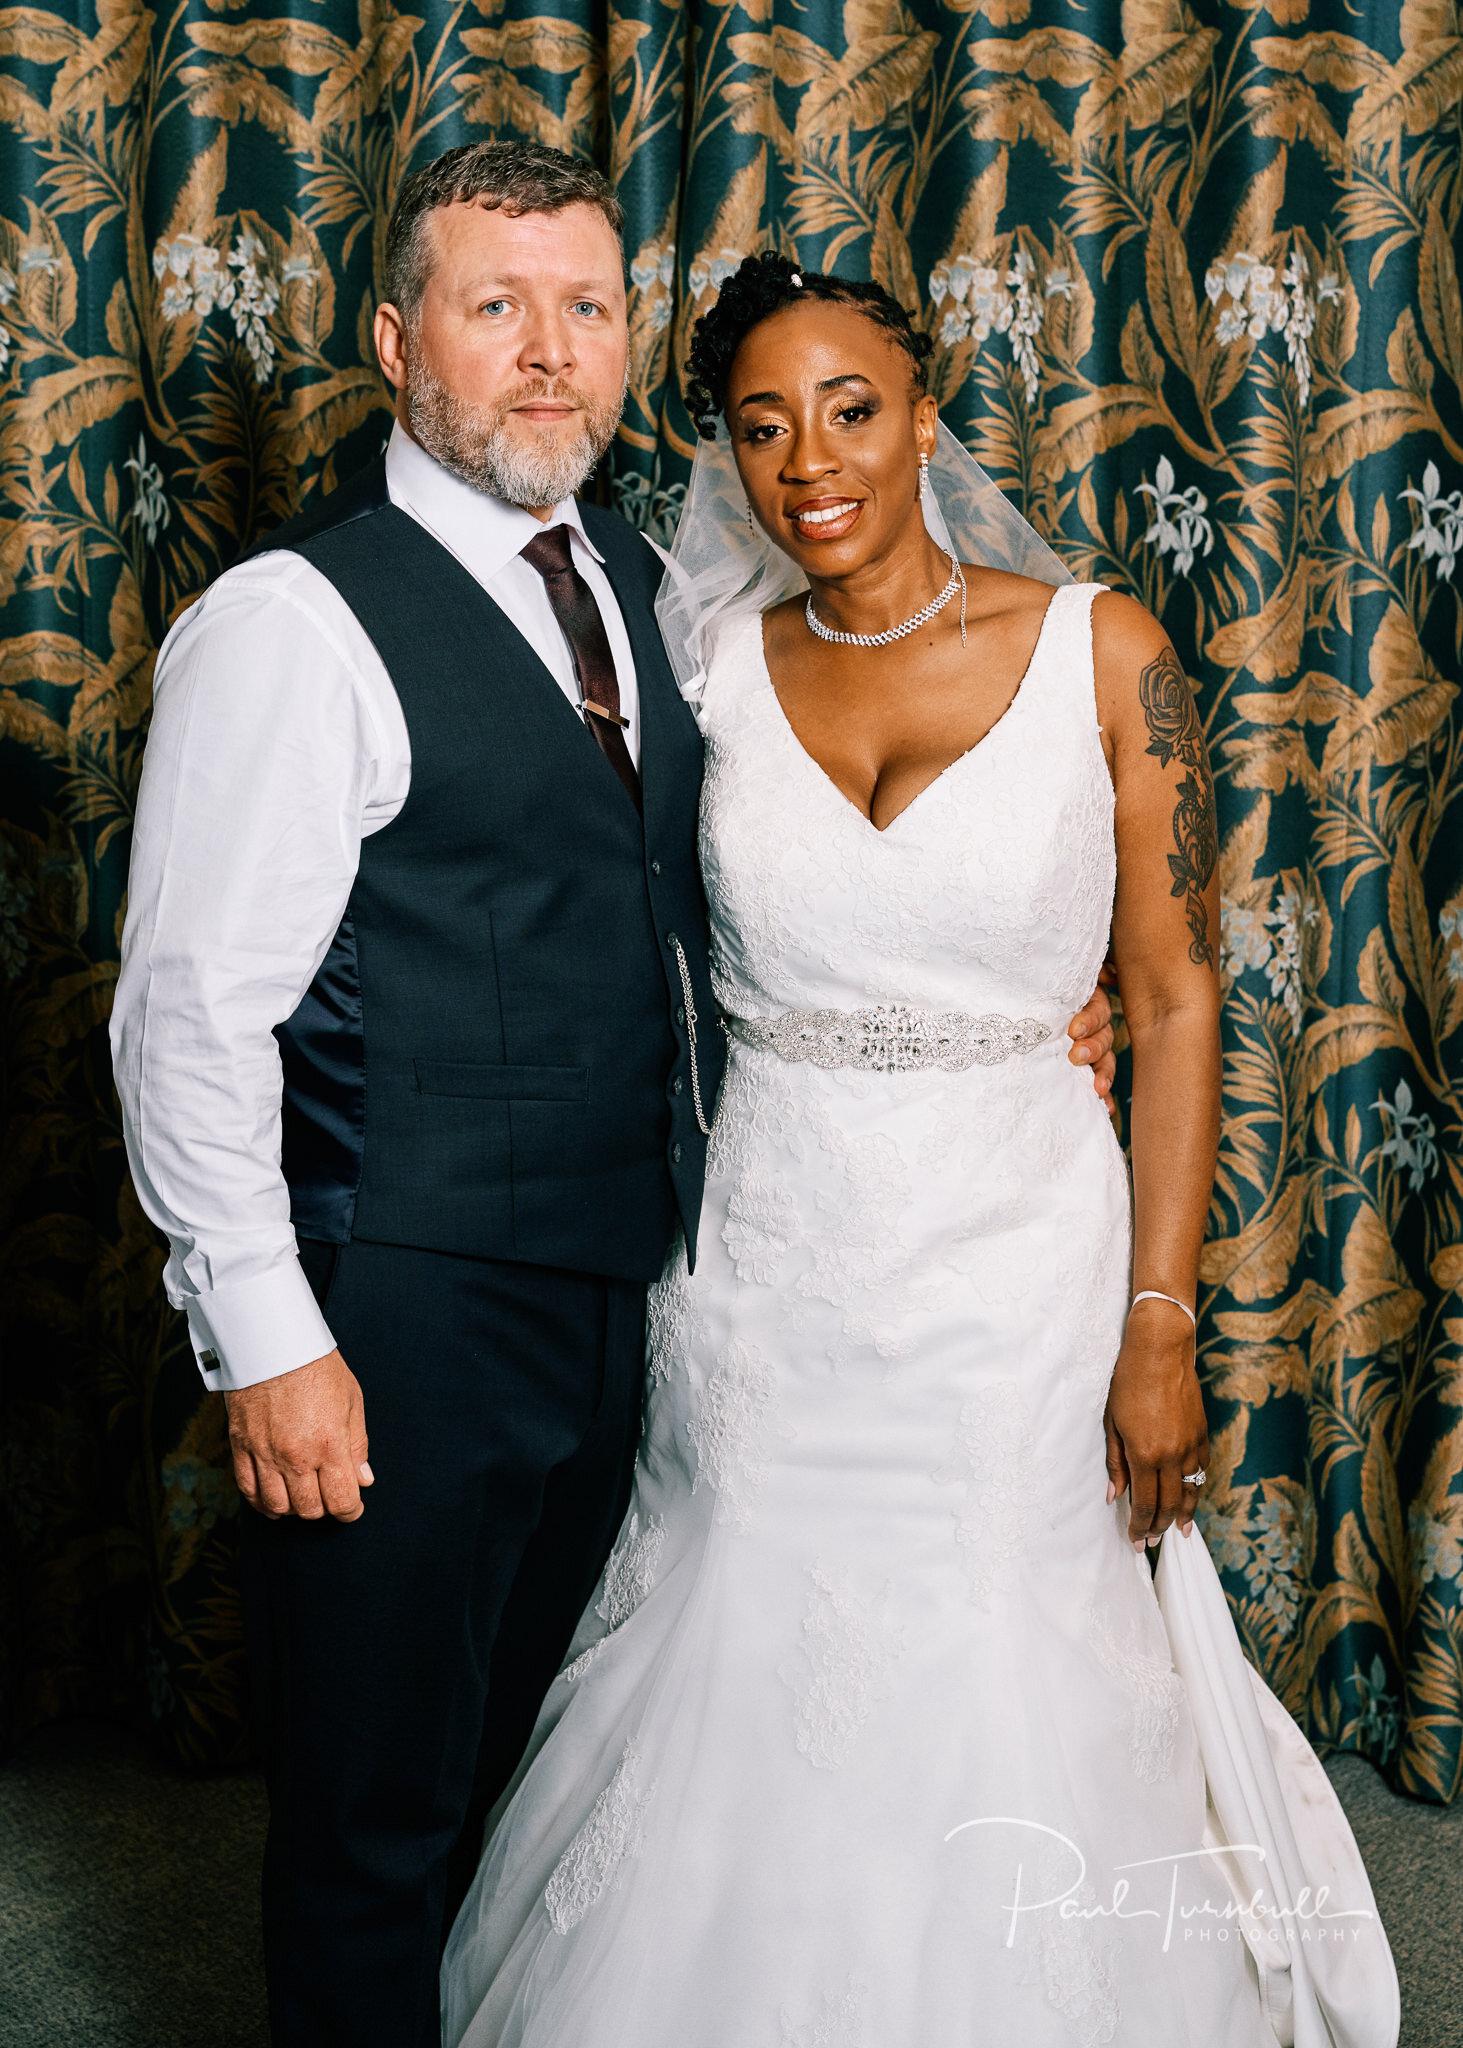 wedding-photographer-hull-yorkshire-lazaat-hotel-carlene-steve-31.jpg